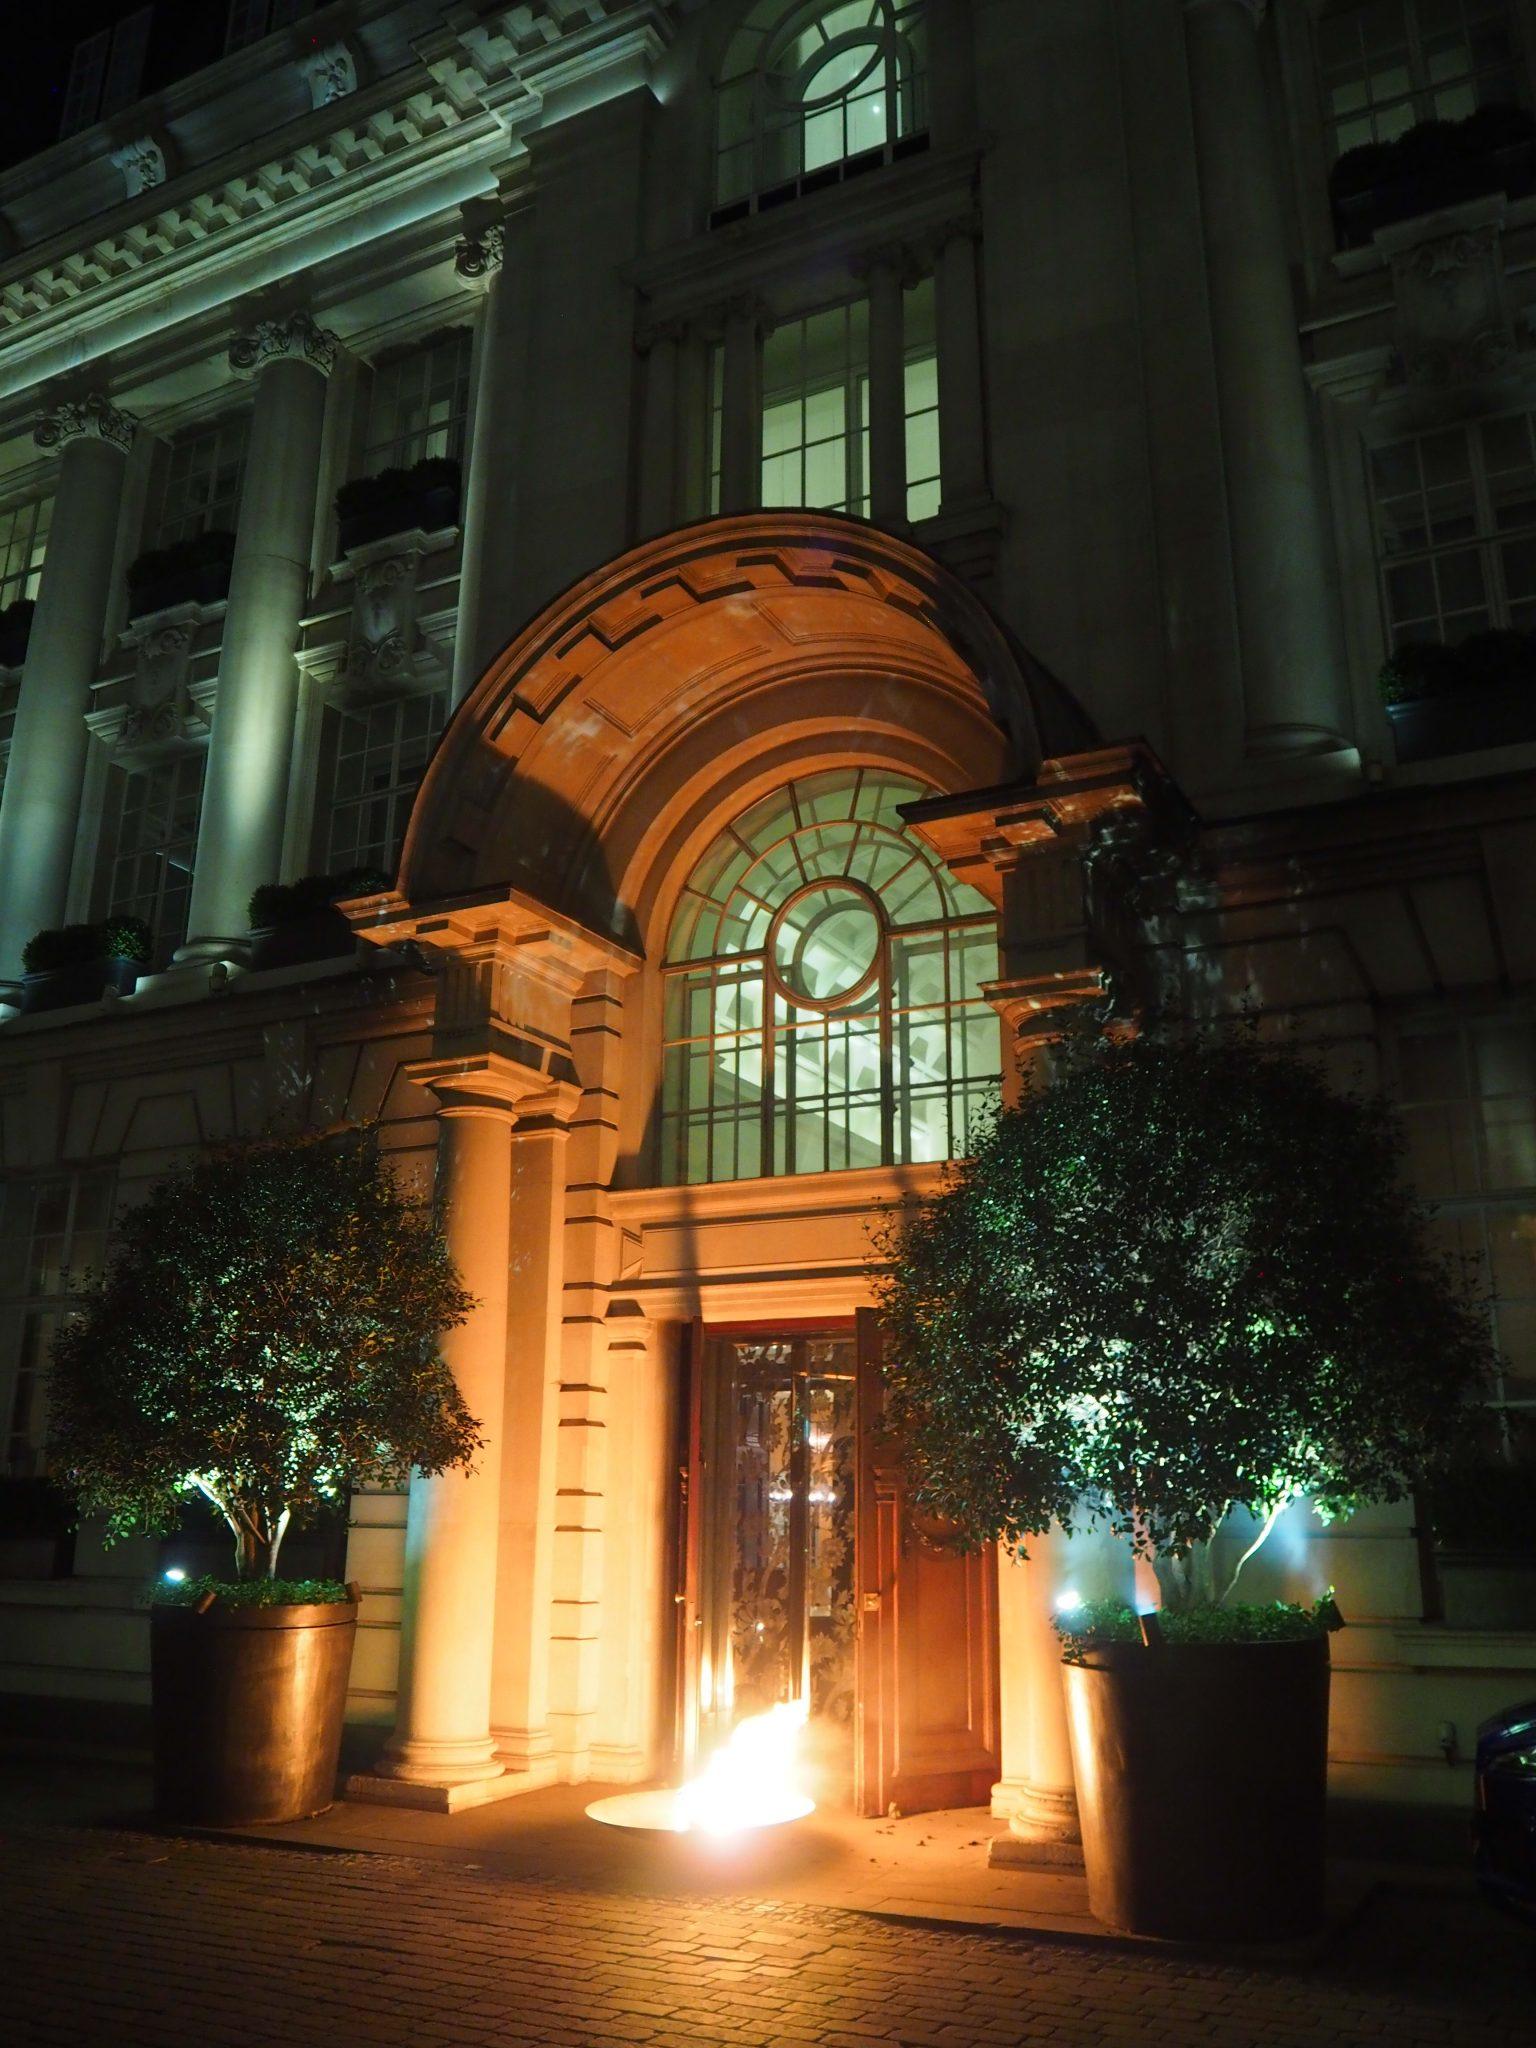 The Rosewood London courtyard (night)